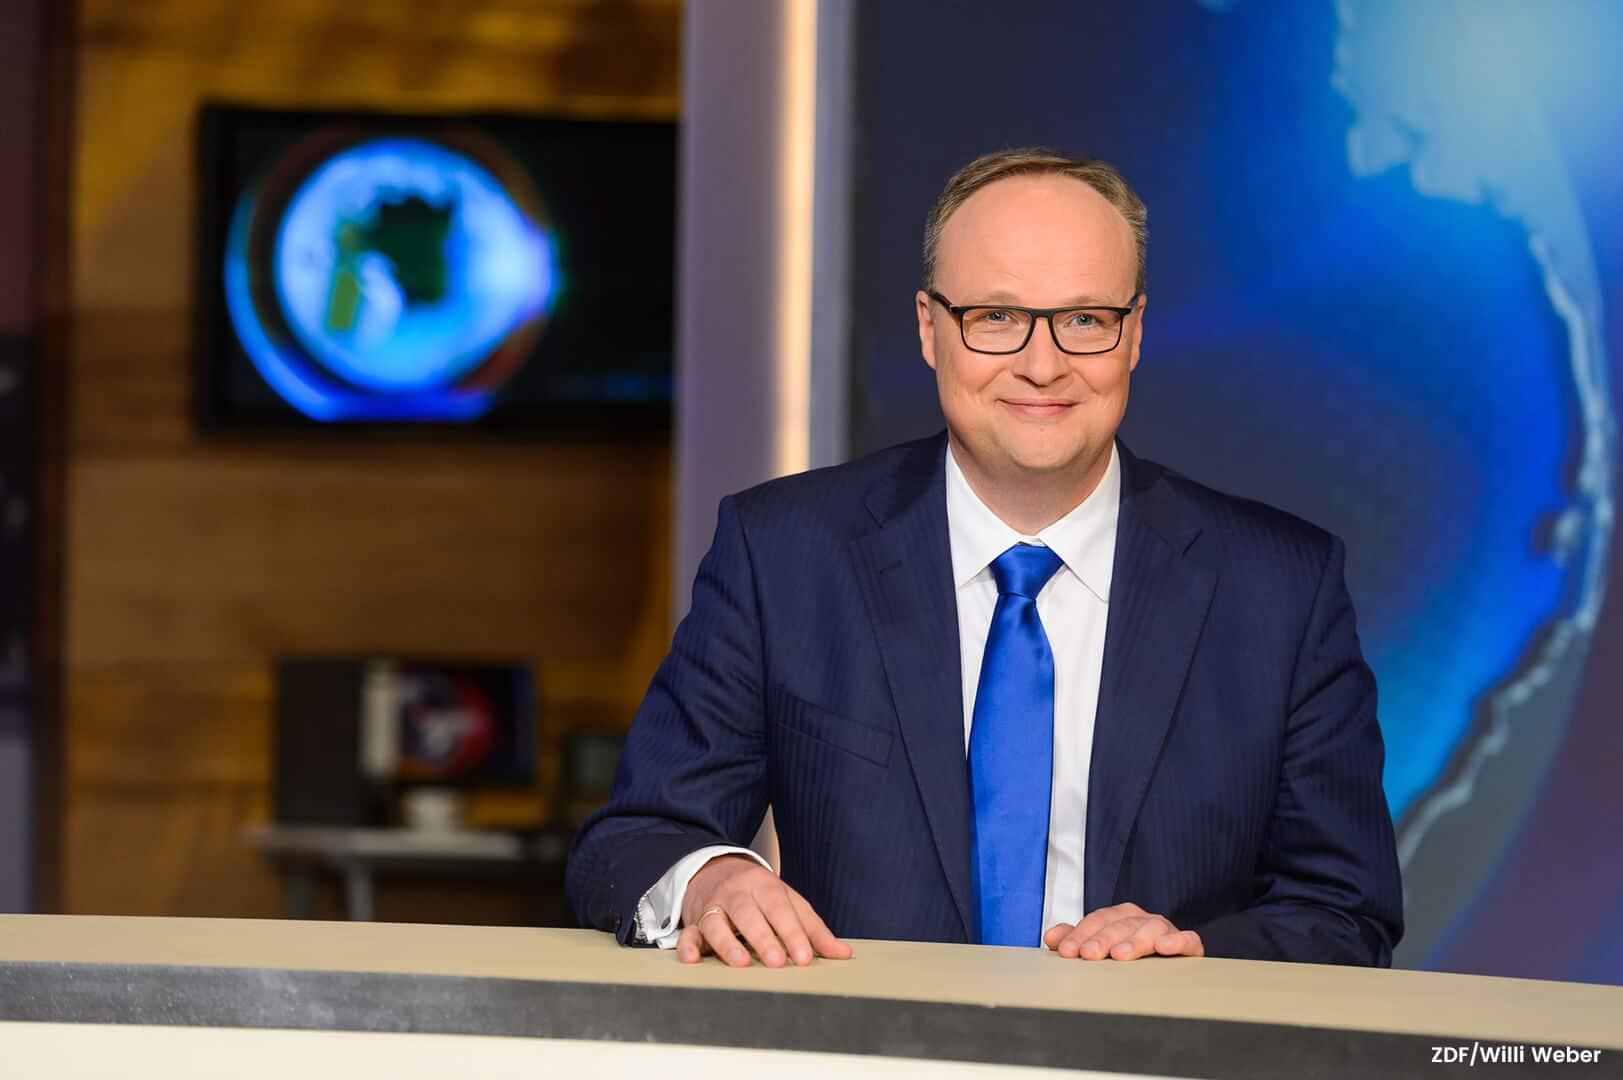 ZDF/Willi Weber